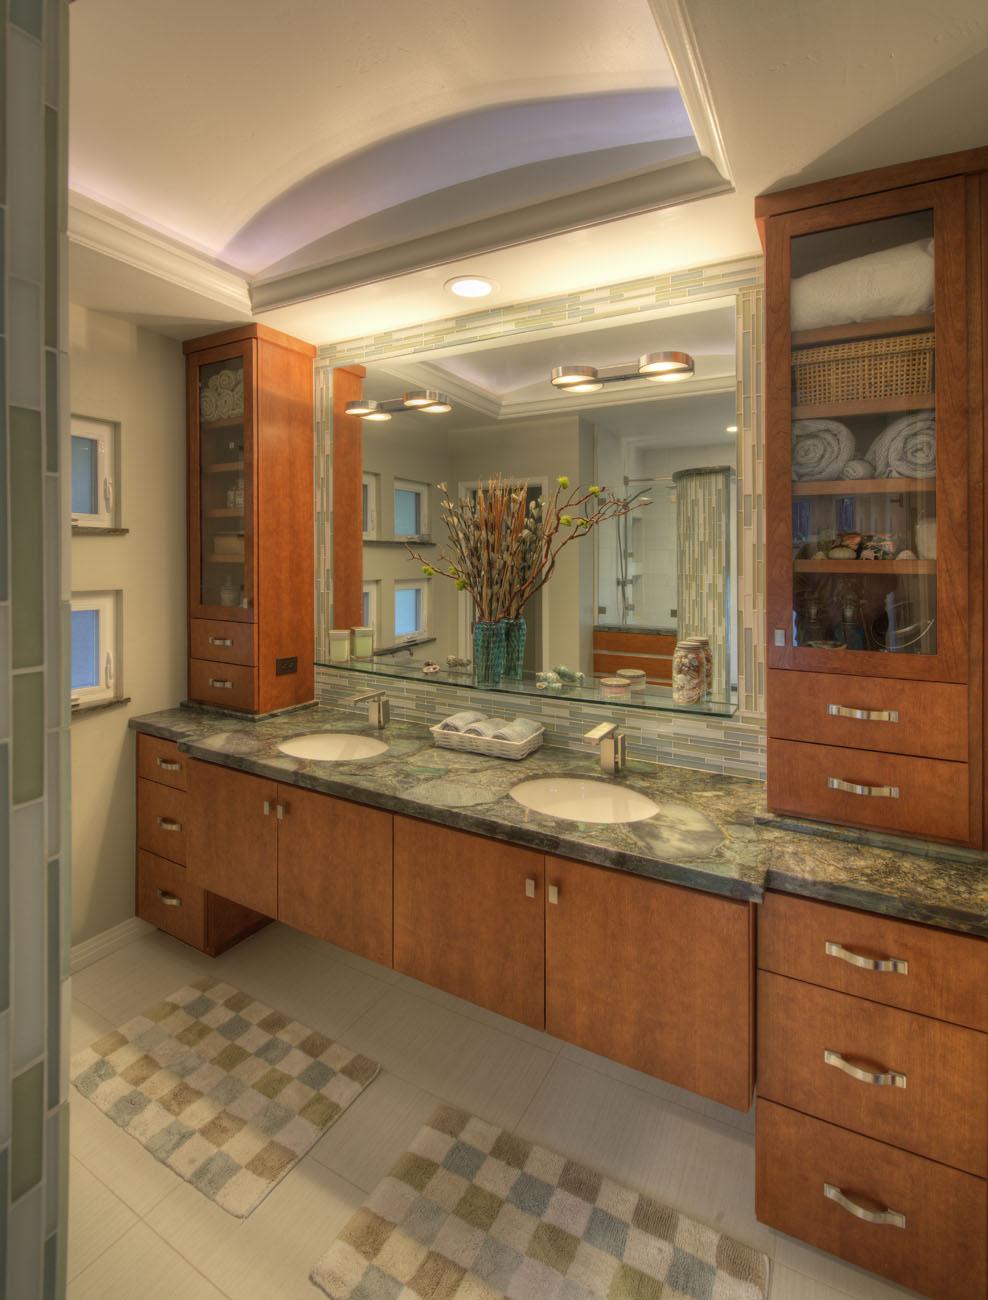 Before After Bathroom Remodel Gallery In San Diego Lars Remodeling Design